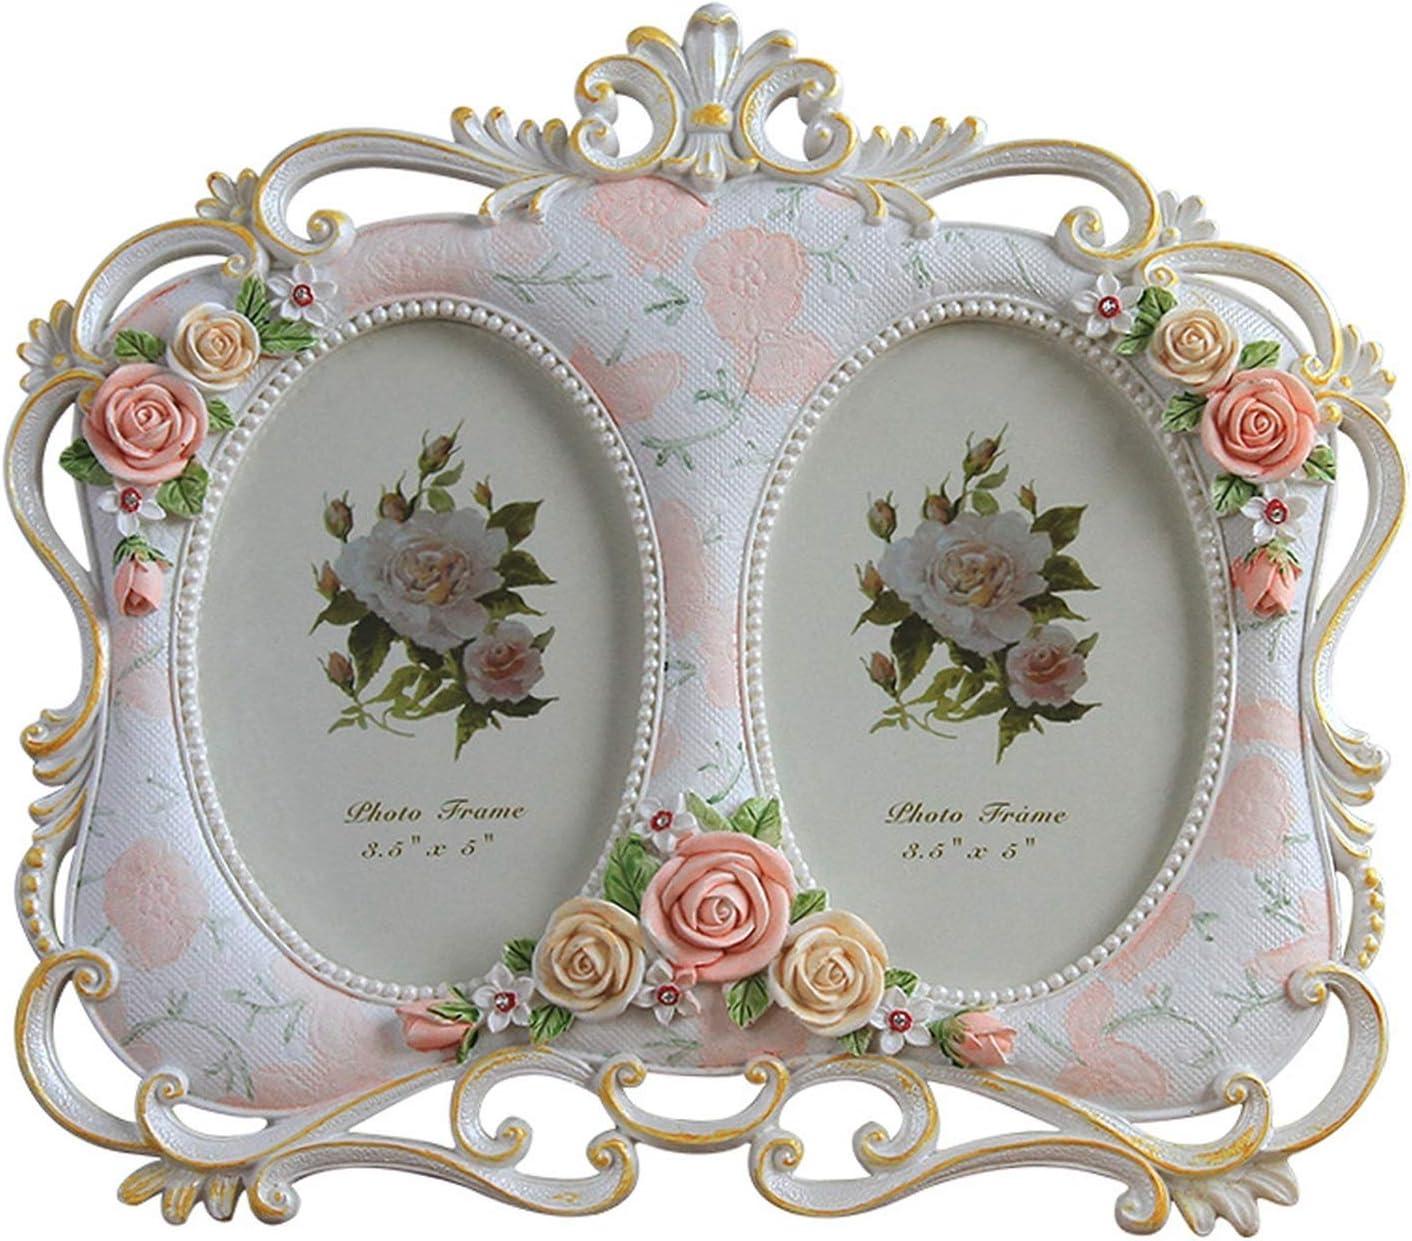 Amazon Com Romantic Flower Decor Photos Frames Home Decor Picture Frames Single Double Windows Frames For Family Wedding Couples Marco Foto 5 Inch Double Hole